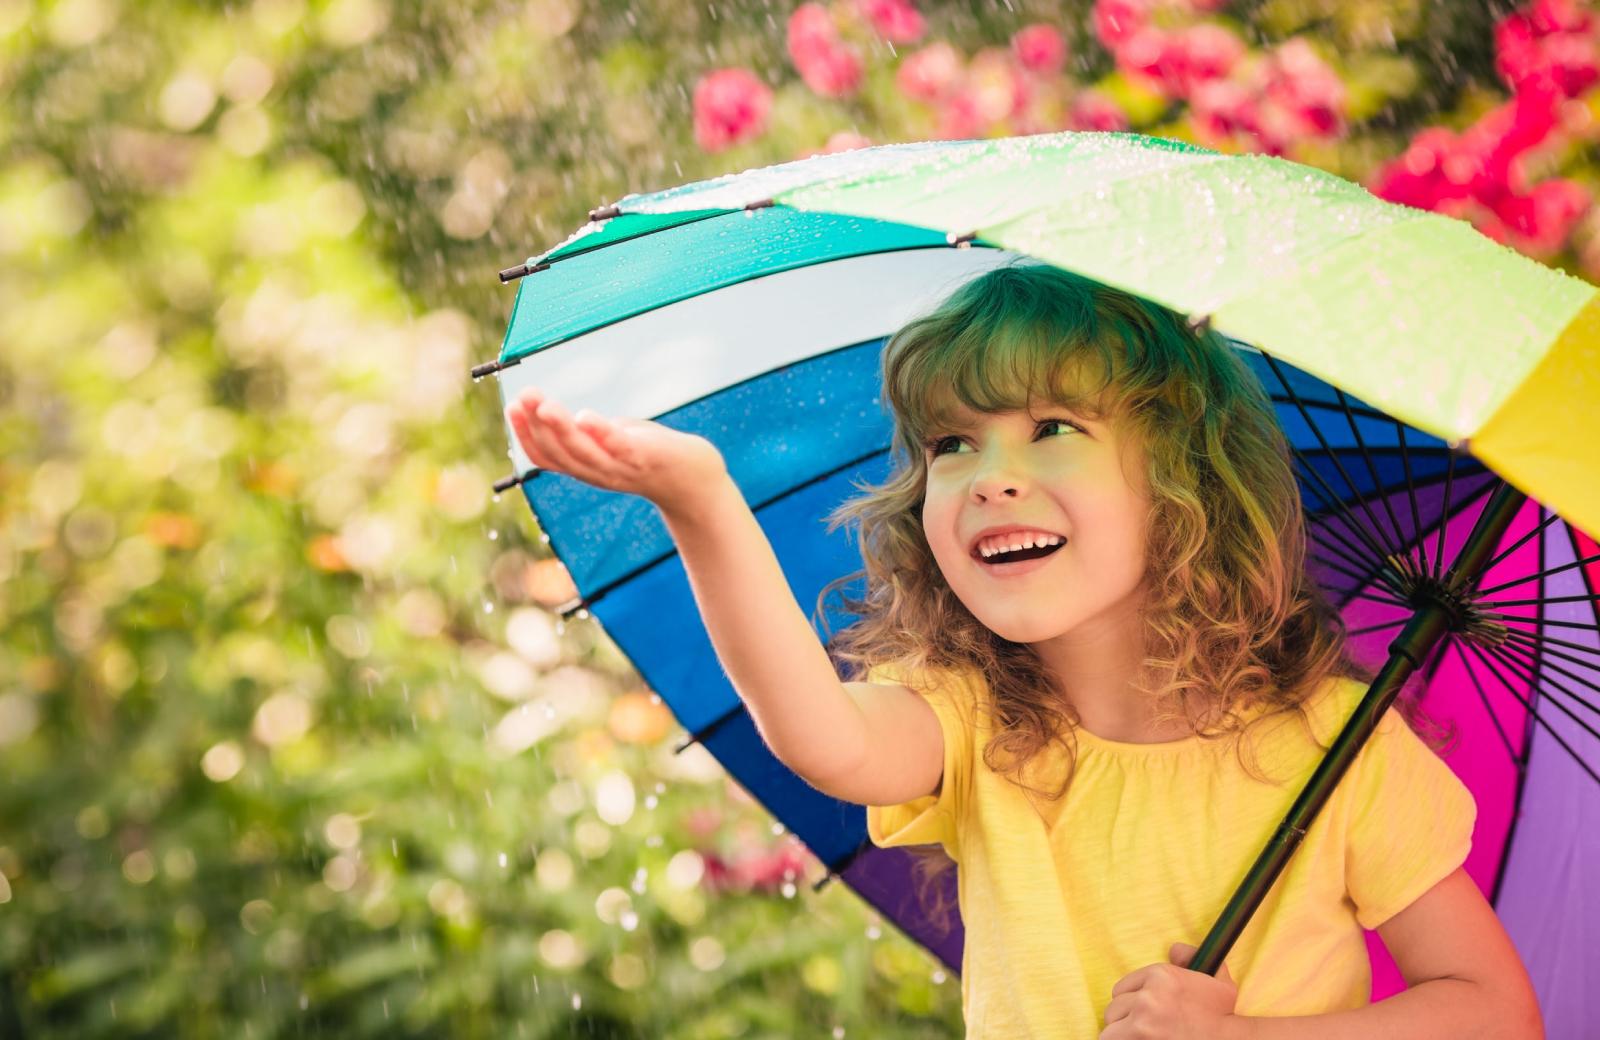 Rain - Altana Apts Glendale